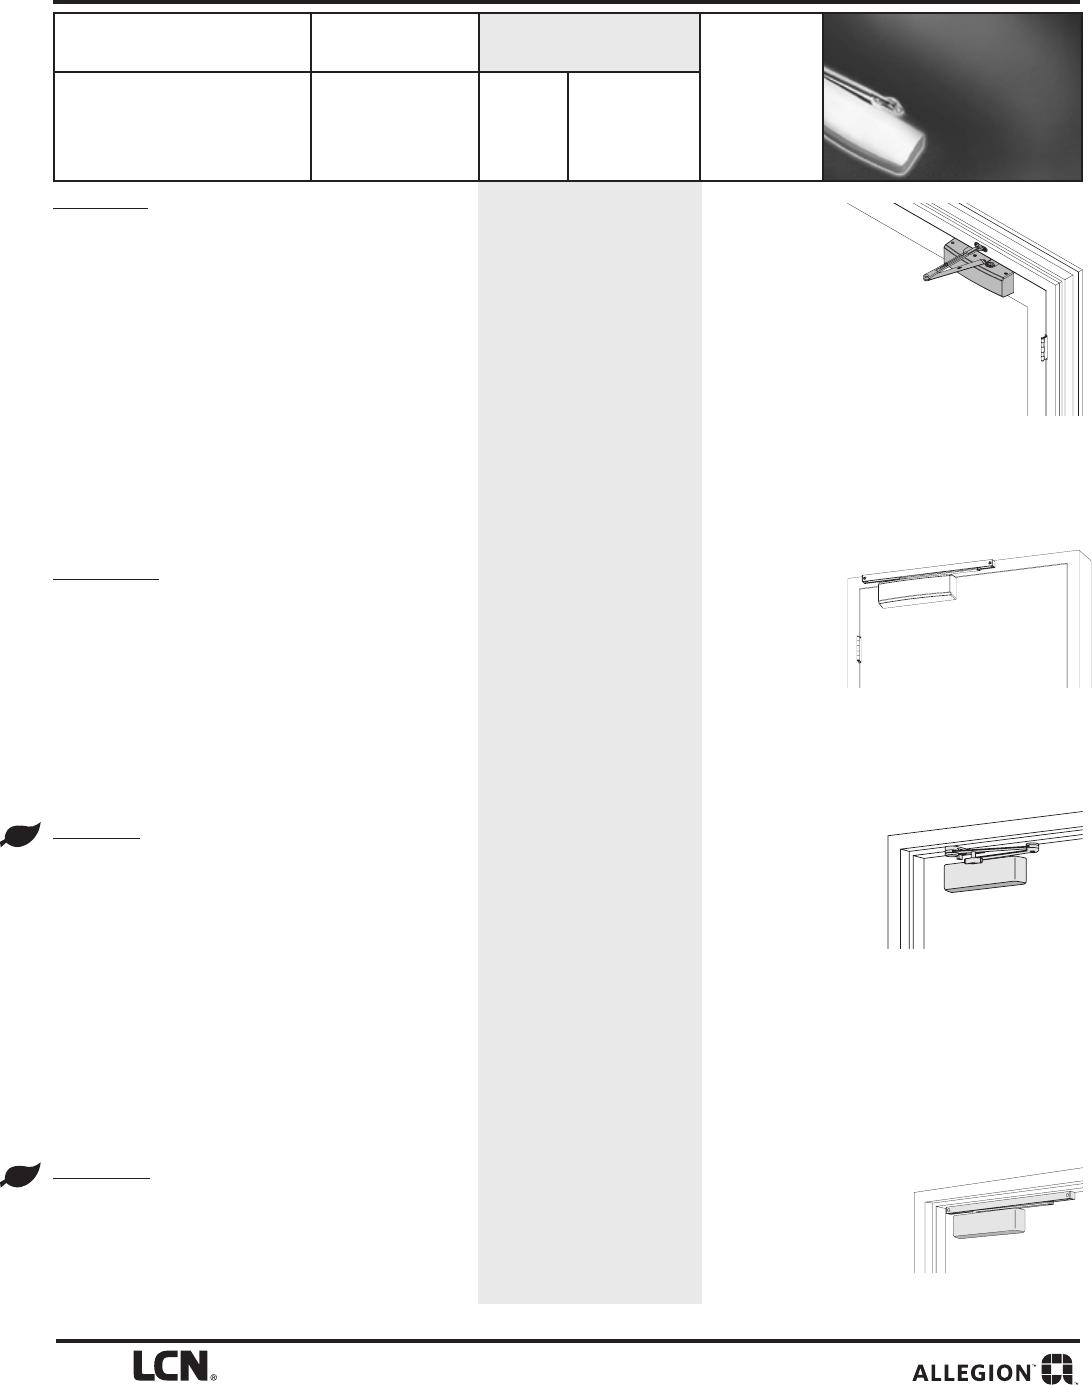 Slim Line Design Regular Arm Door Closer LCN 1461 REG- AL New WMS Screws